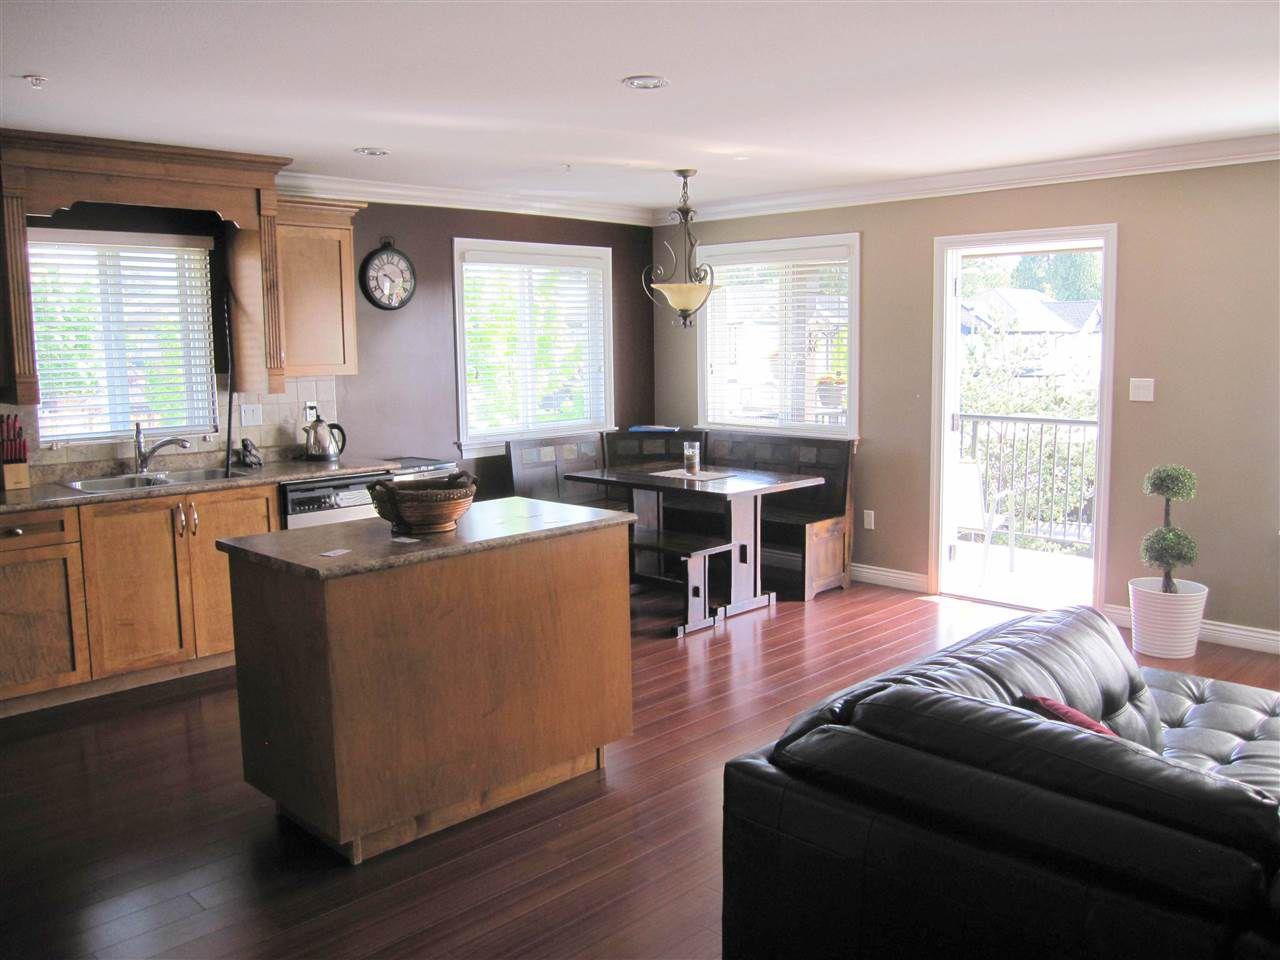 Photo 6: Photos: 11316 236 Street in Maple Ridge: Cottonwood MR House for sale : MLS®# R2062616